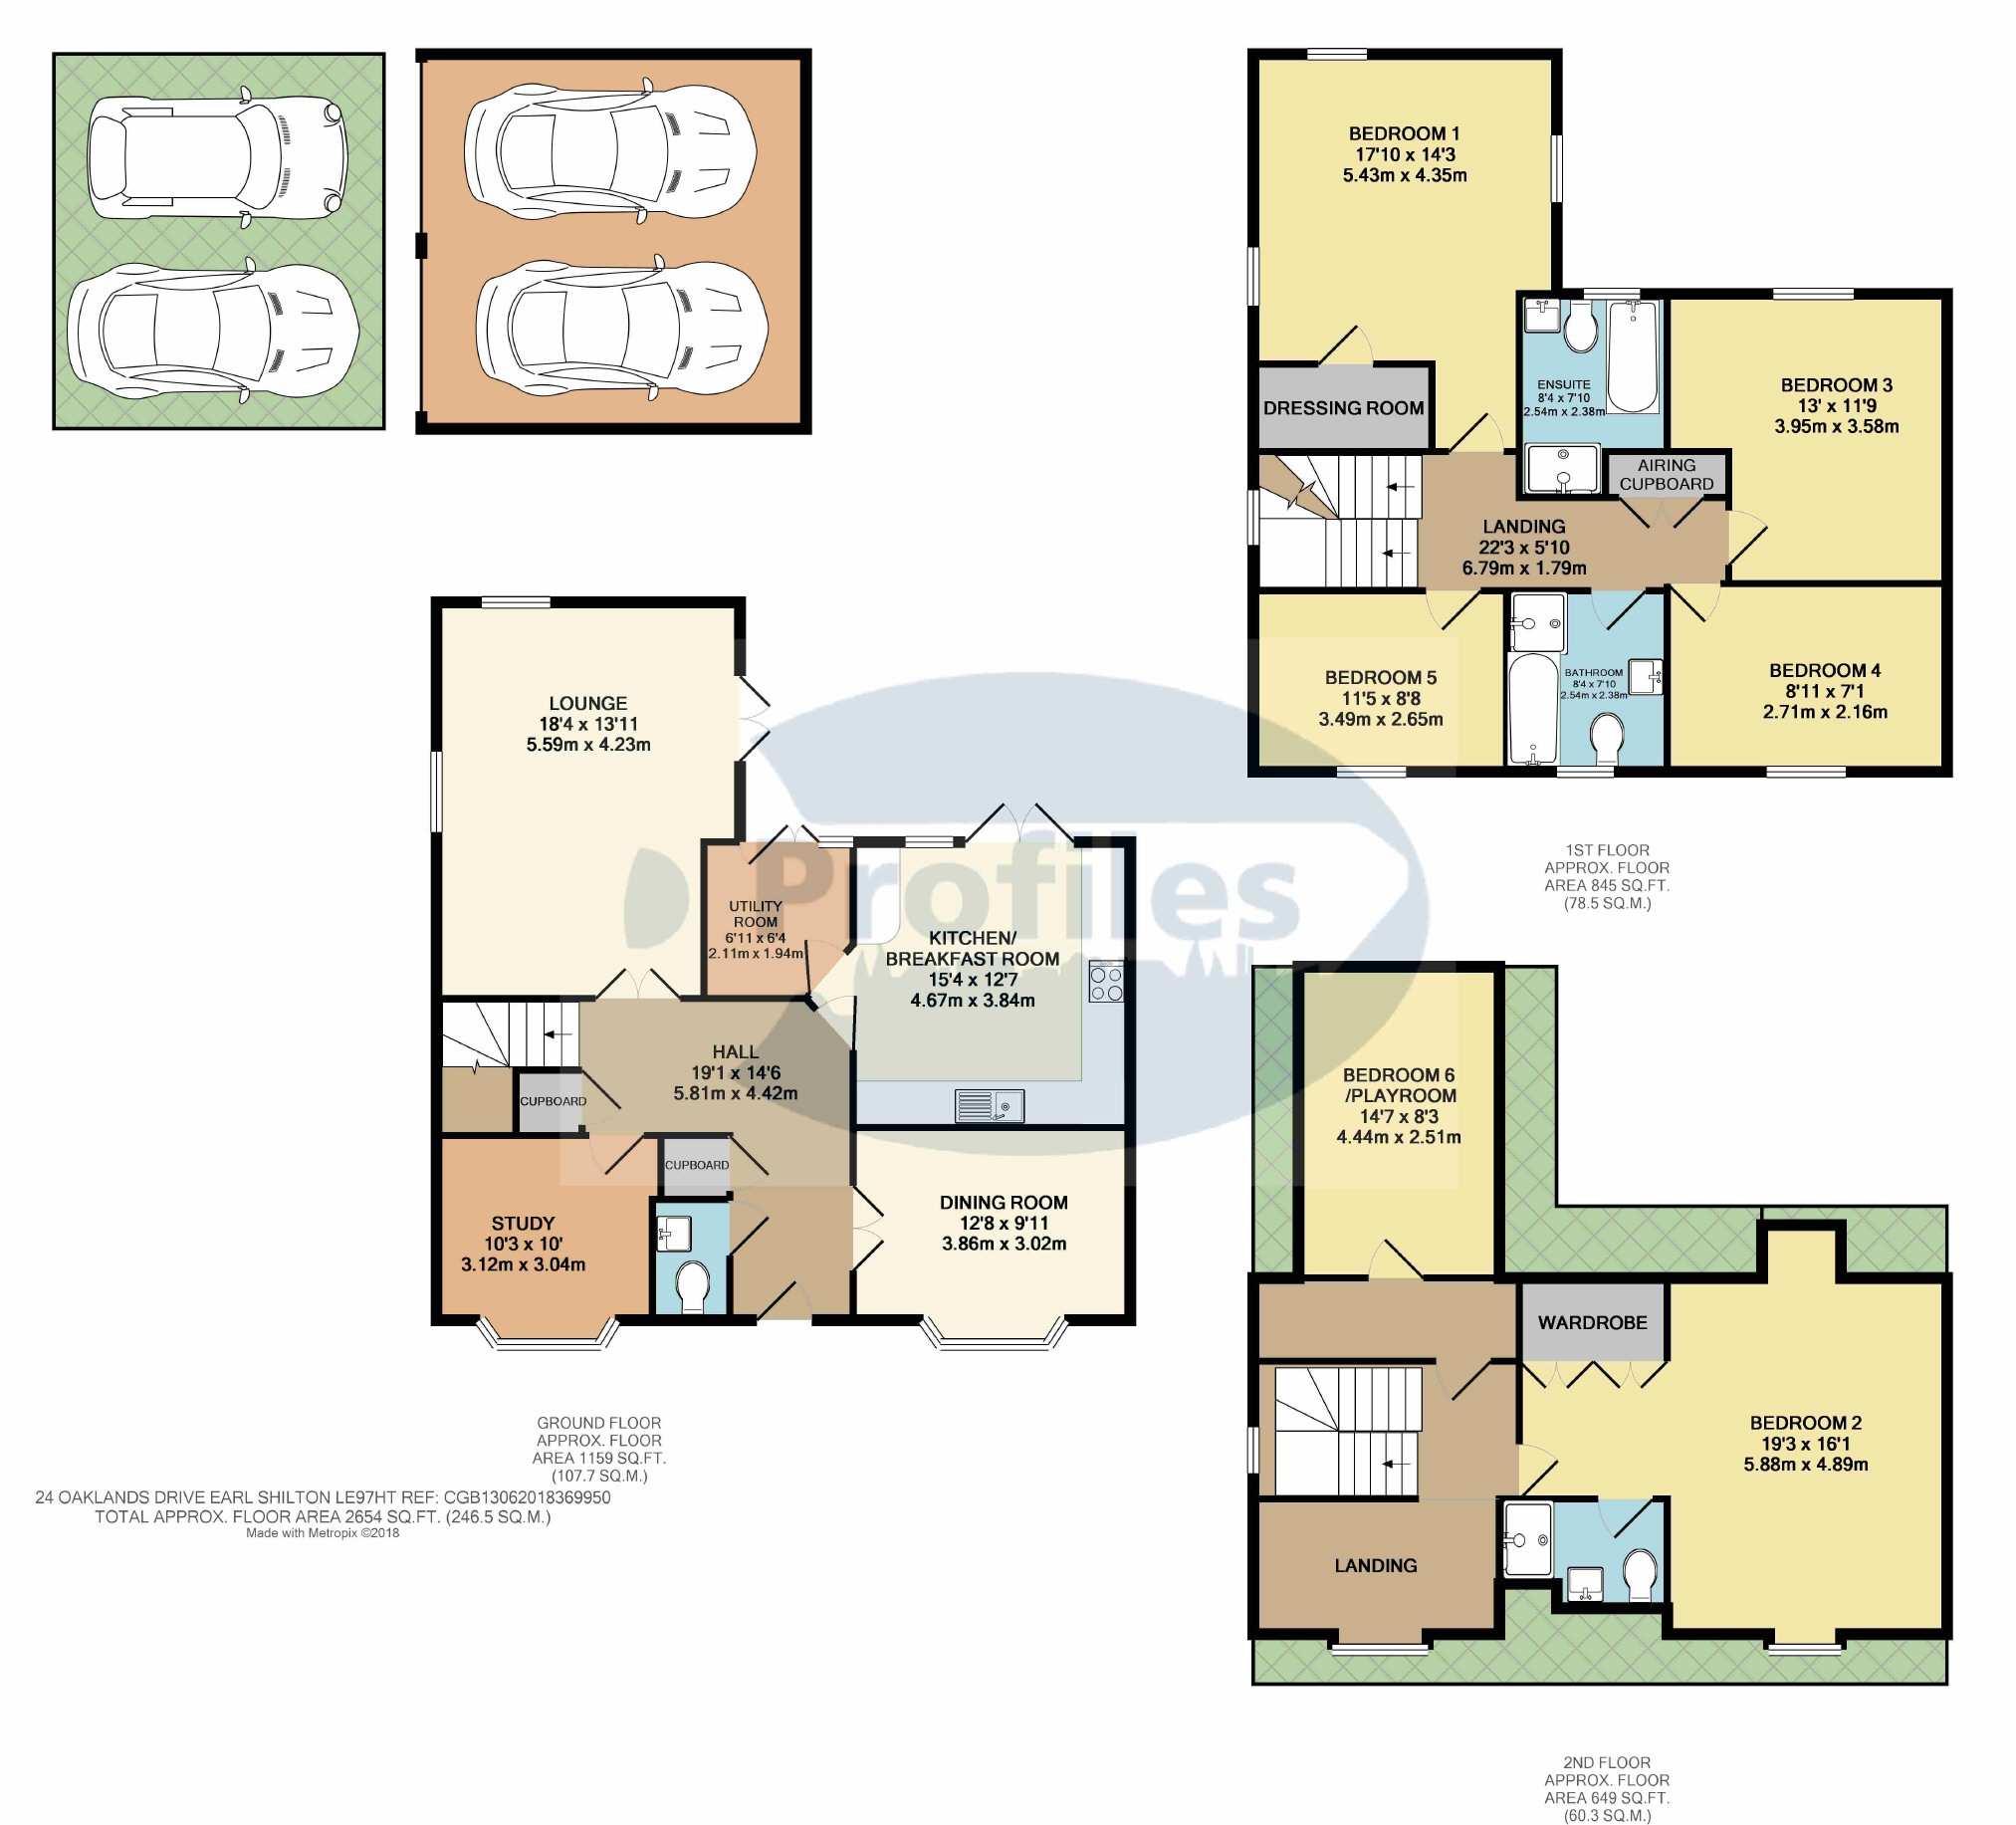 5 Bedroom Property For Sale In Oaklands Drive Earl Shilton 369 995